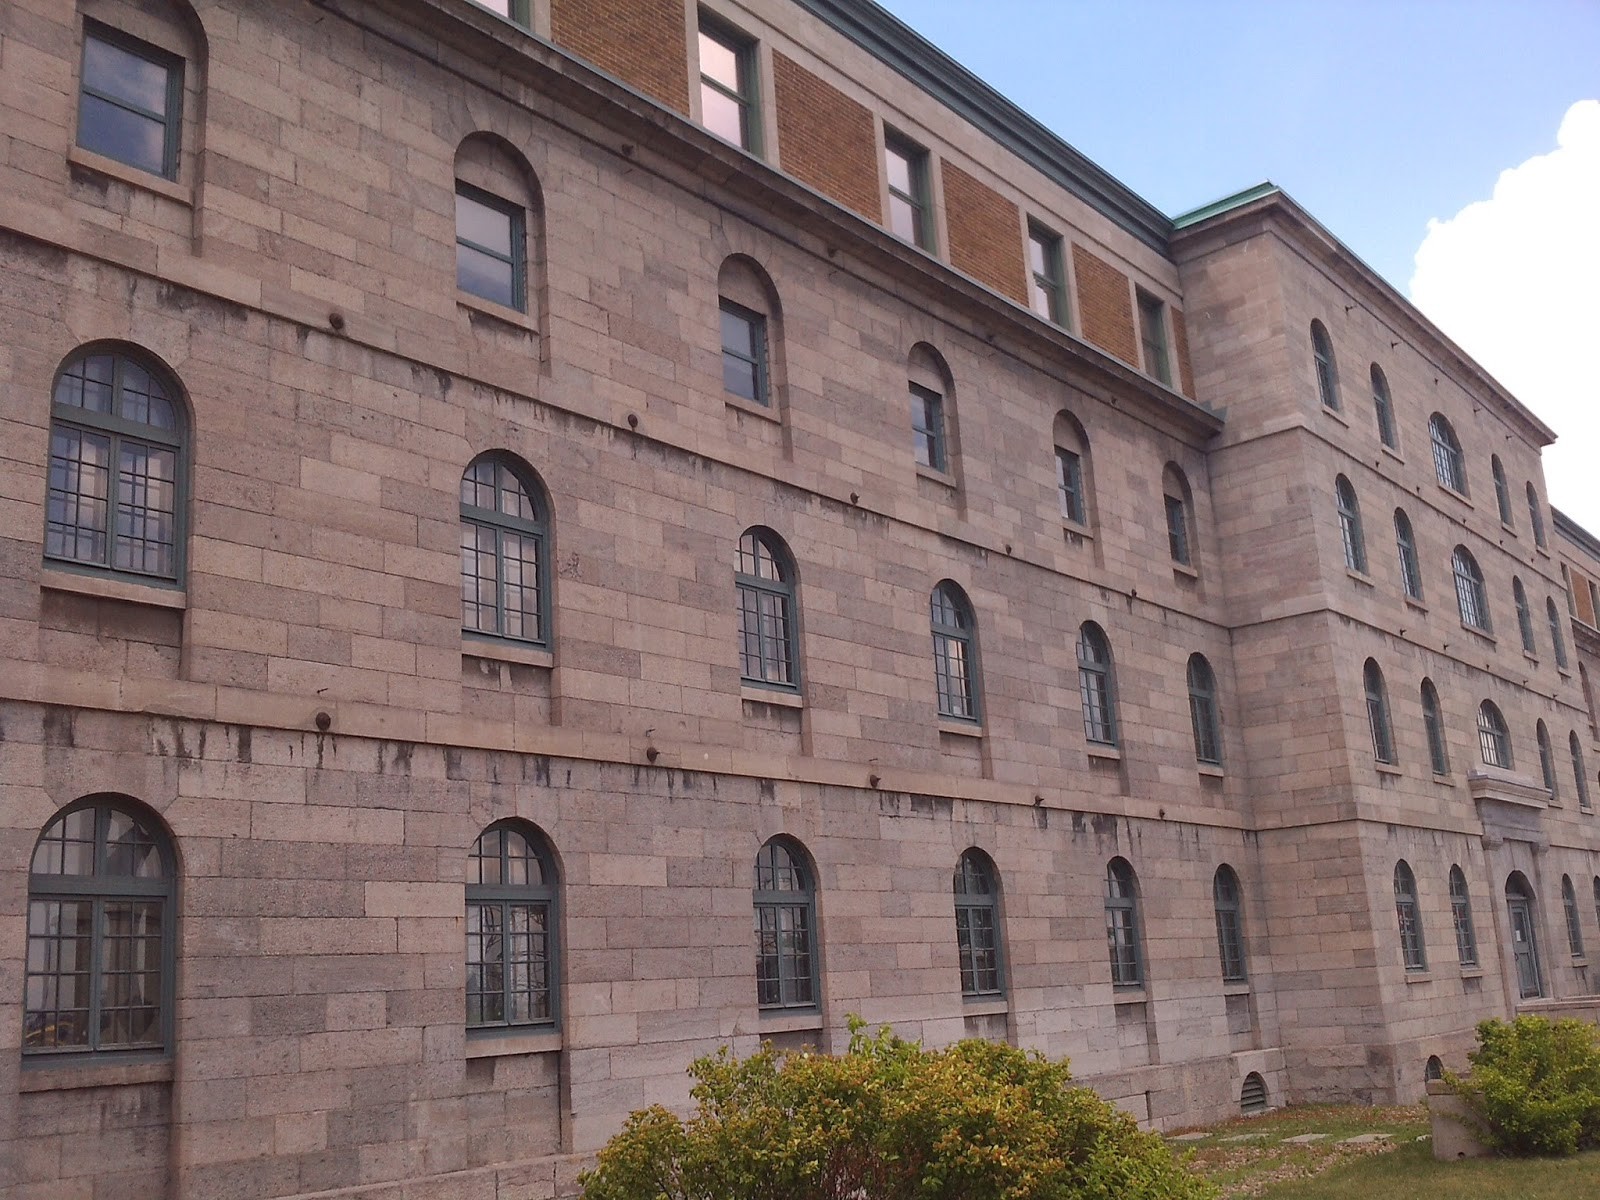 Haunted montreal blog #16 u2013 au pied du courant prison u2013 haunted montreal